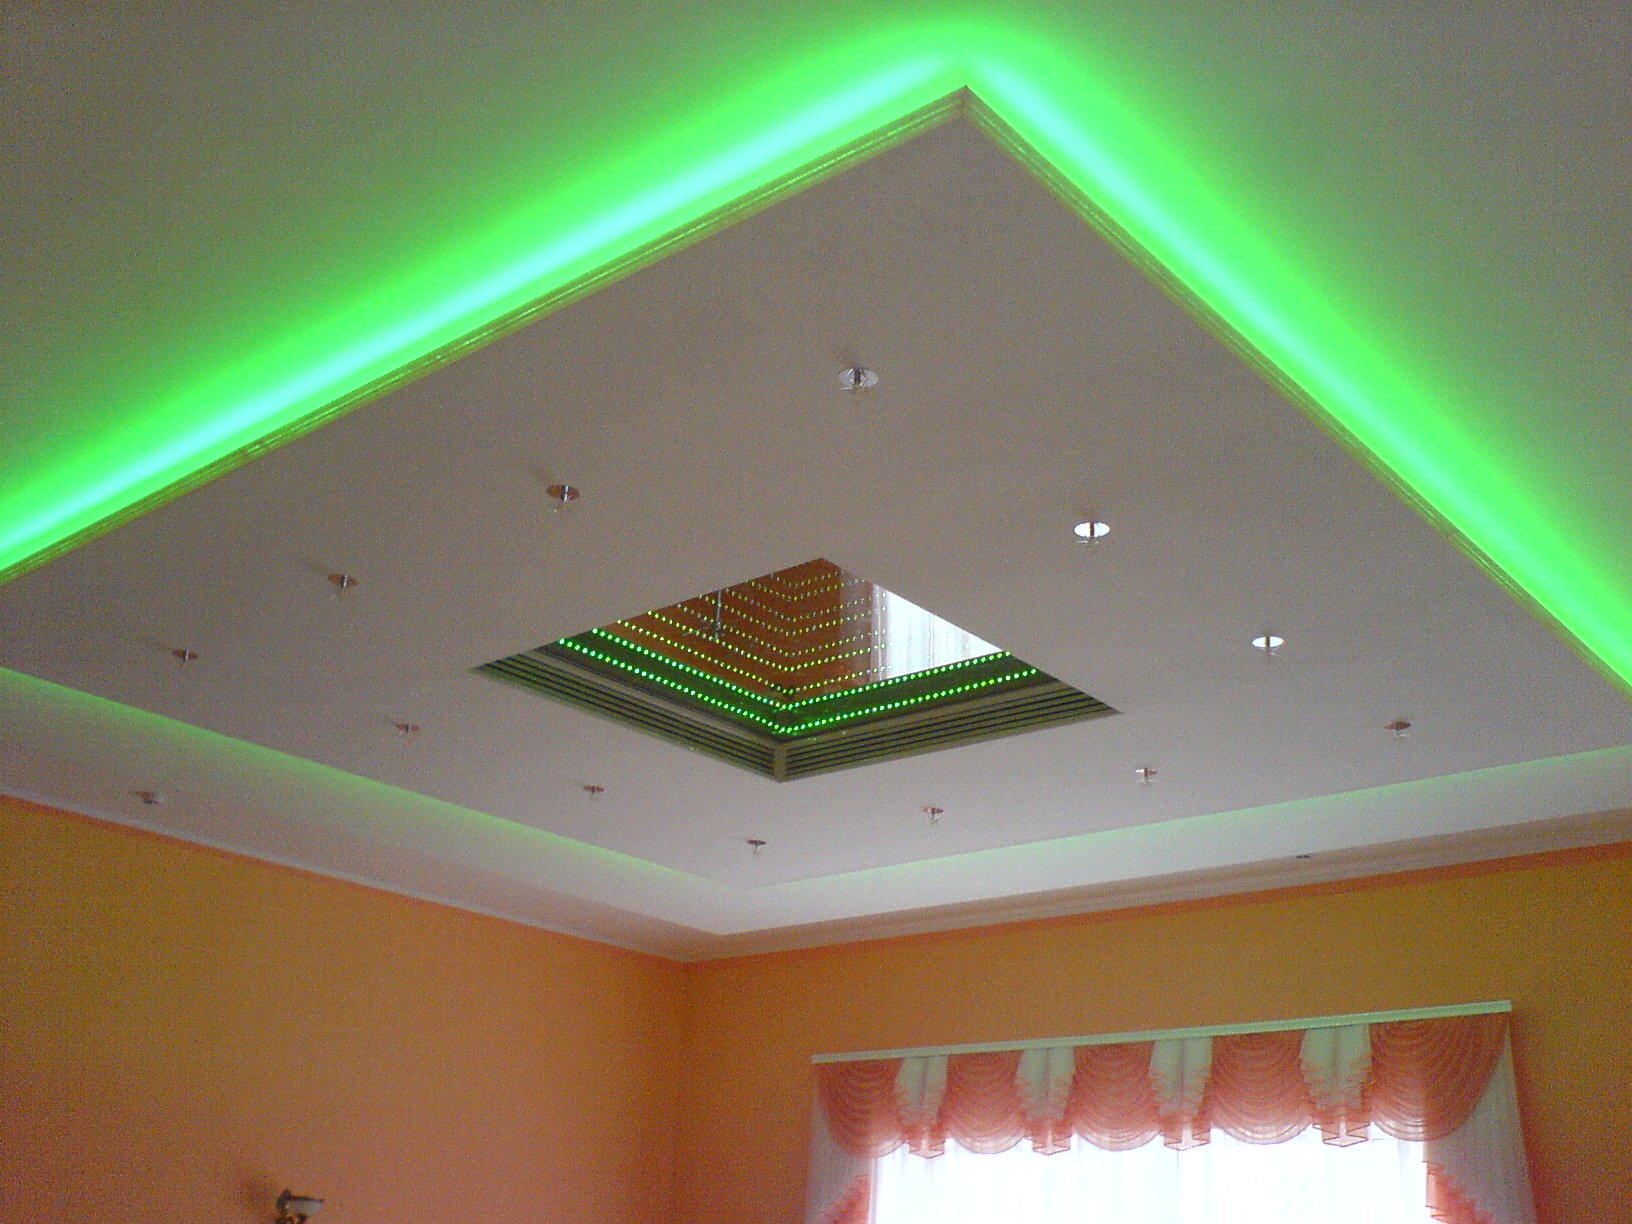 http://sam-sebe-dizainer.com/public/images/Монтаж потолка из гипсокартона с подсветкой